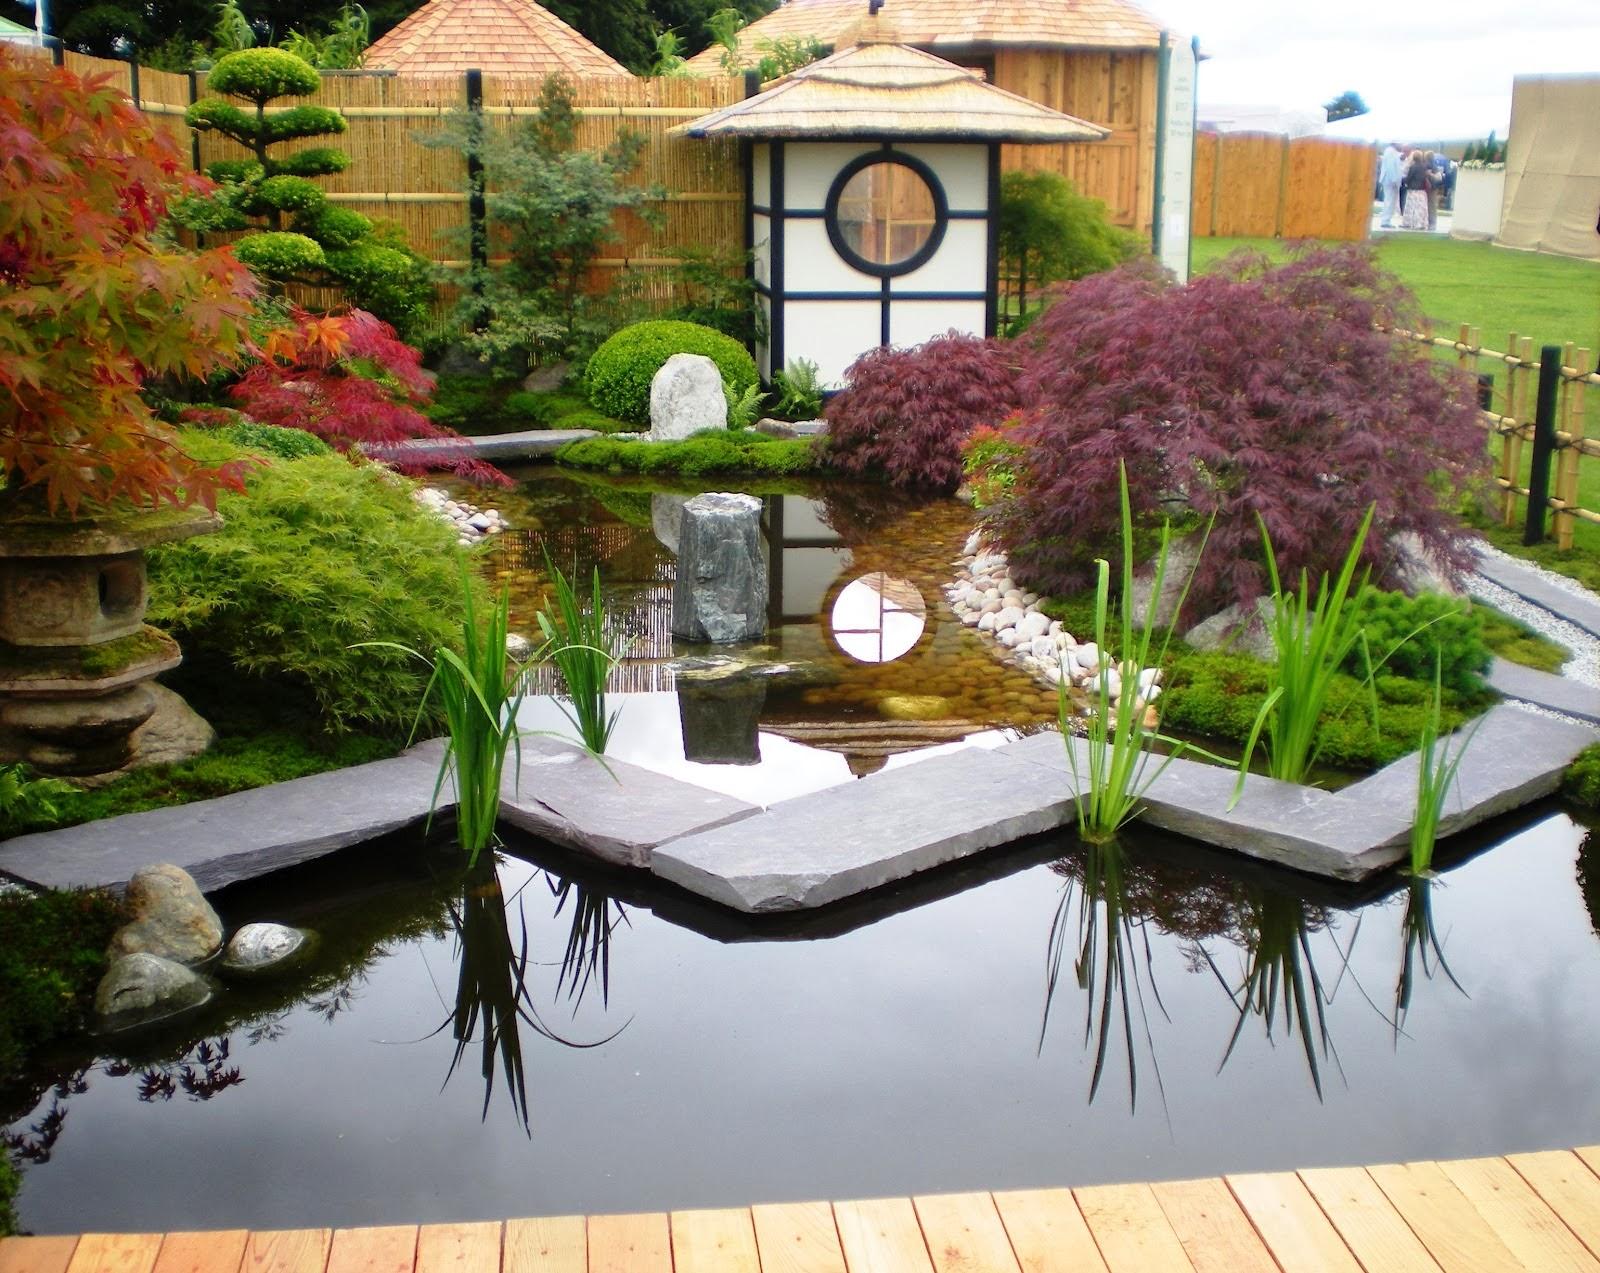 jardines japoneses 3 parte - Jardines Japoneses